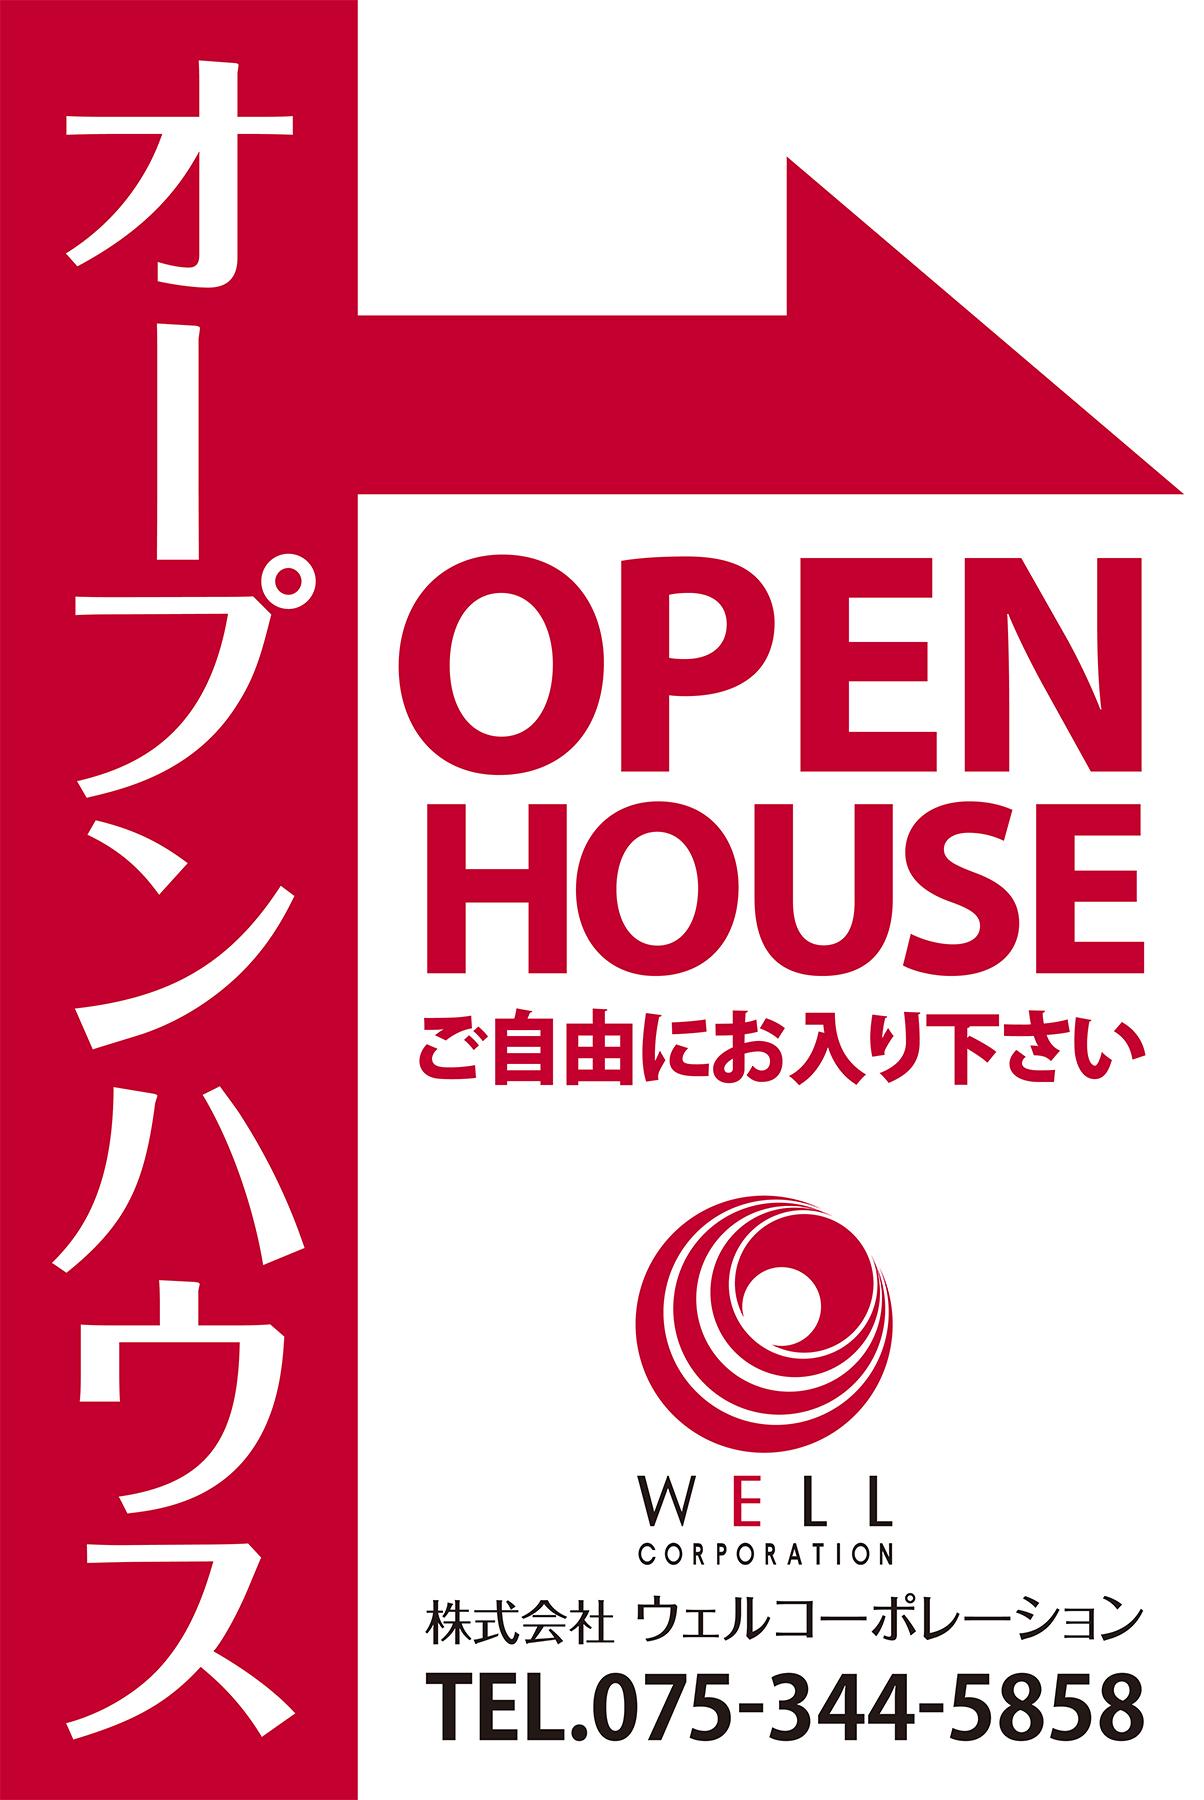 A型看板-オープンハウス